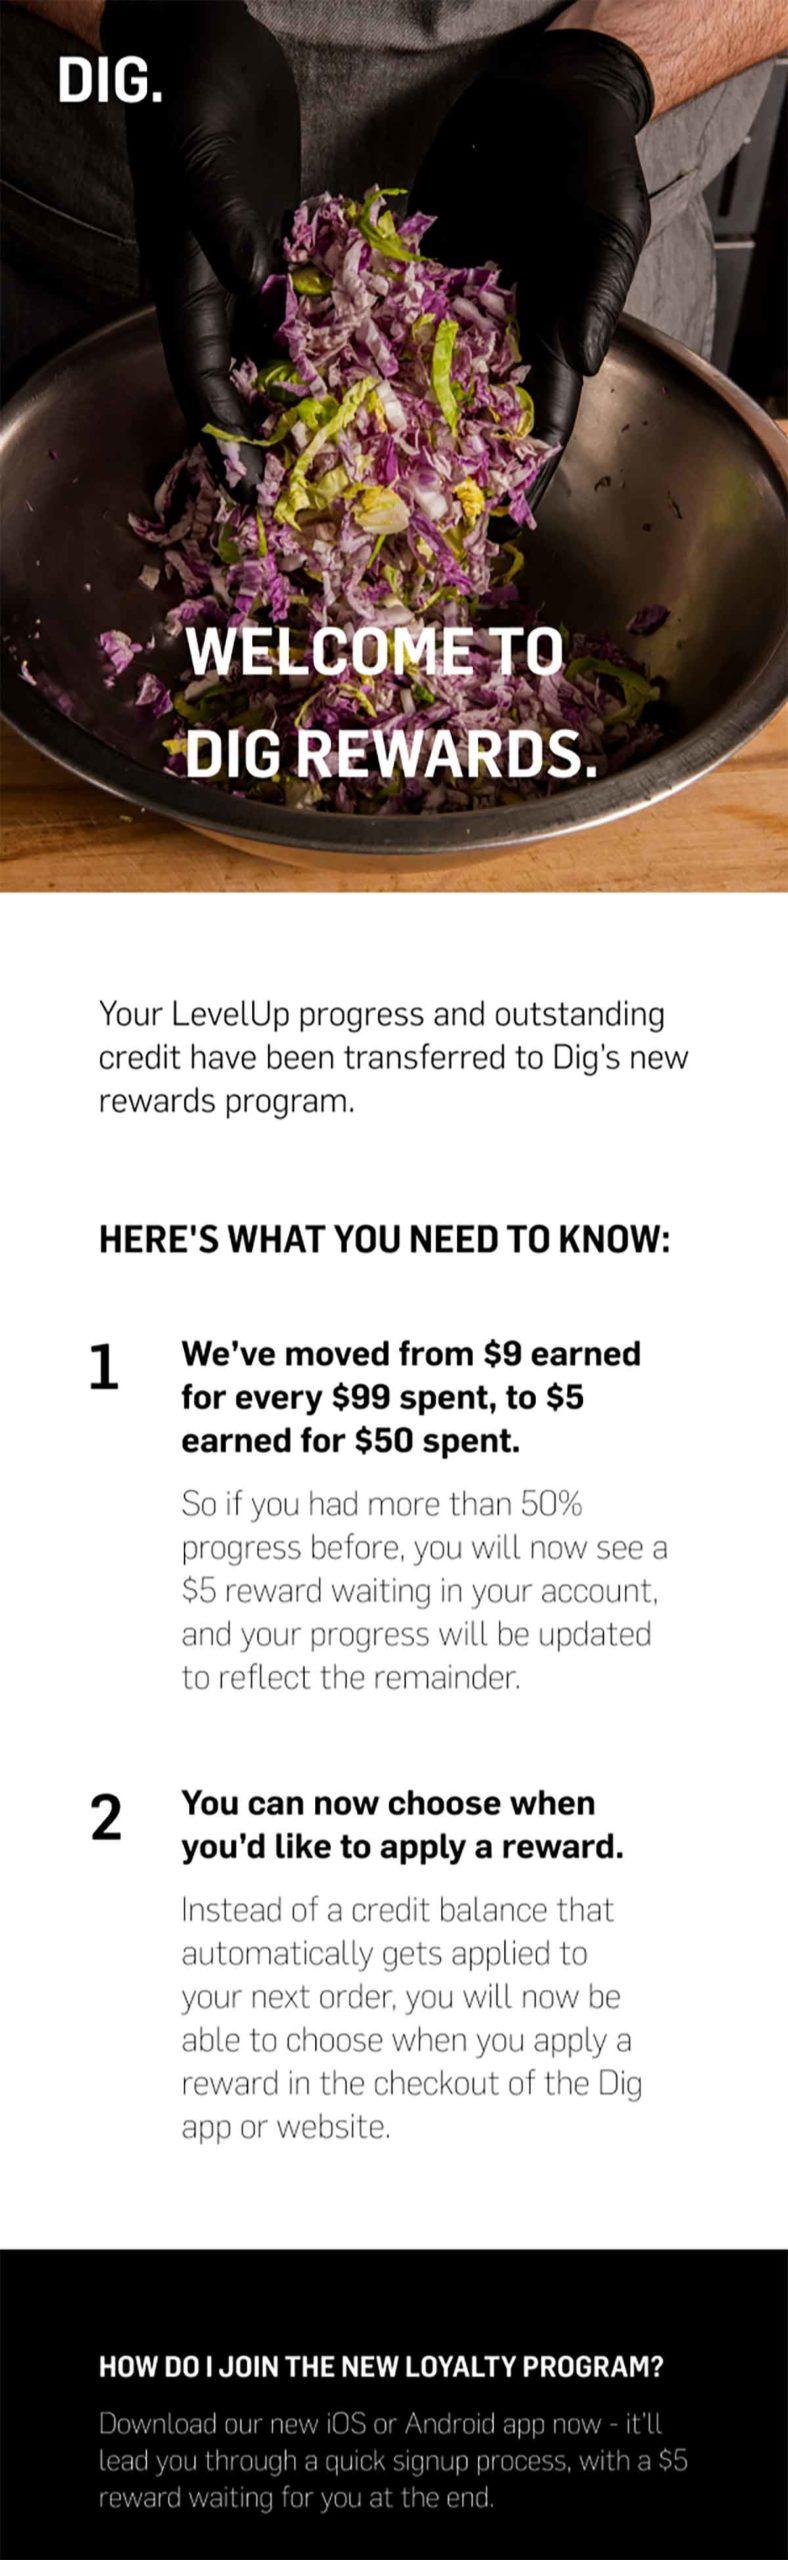 DIG transitional loyalty program email